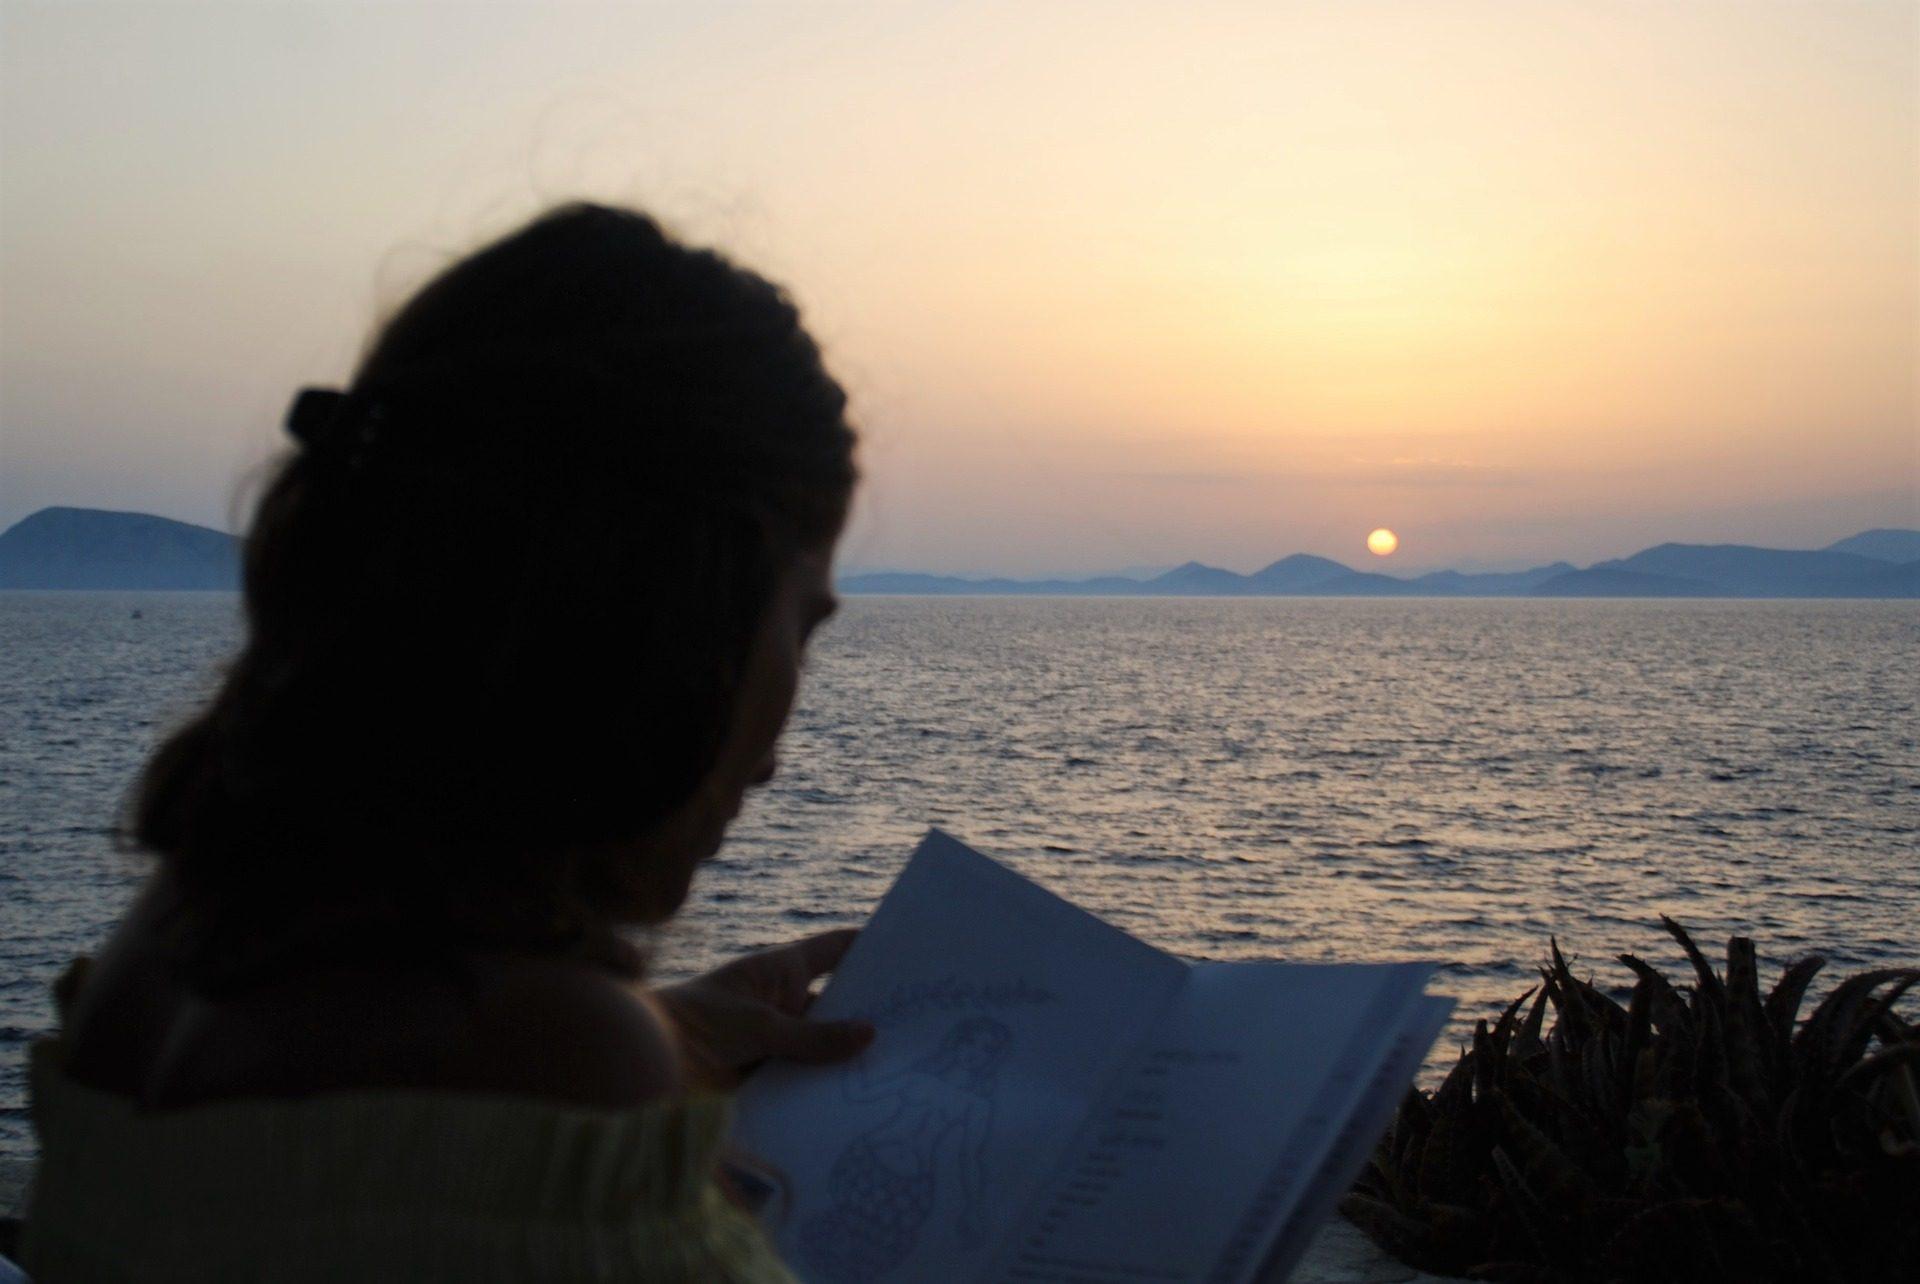 महिला, पुस्तक, पढ़ना, सूर्यास्त, सागर, क्षितिज - HD वॉलपेपर - प्रोफेसर-falken.com